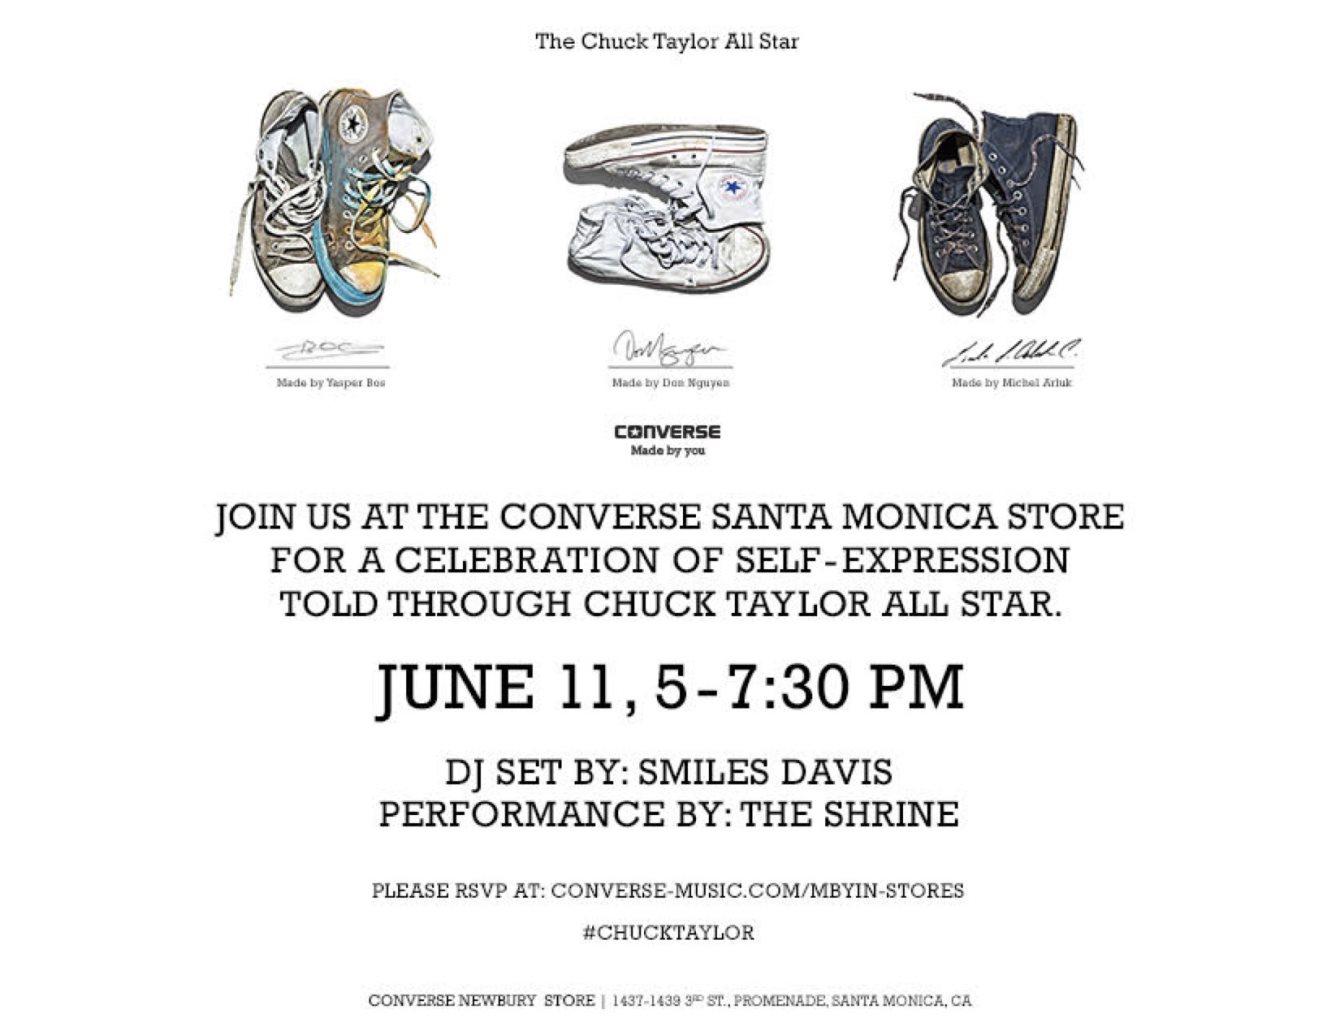 e6771509df1a Line-up  . DJ Smiles Davis The Shrine. Join us at the Converse Santa Monica  ...